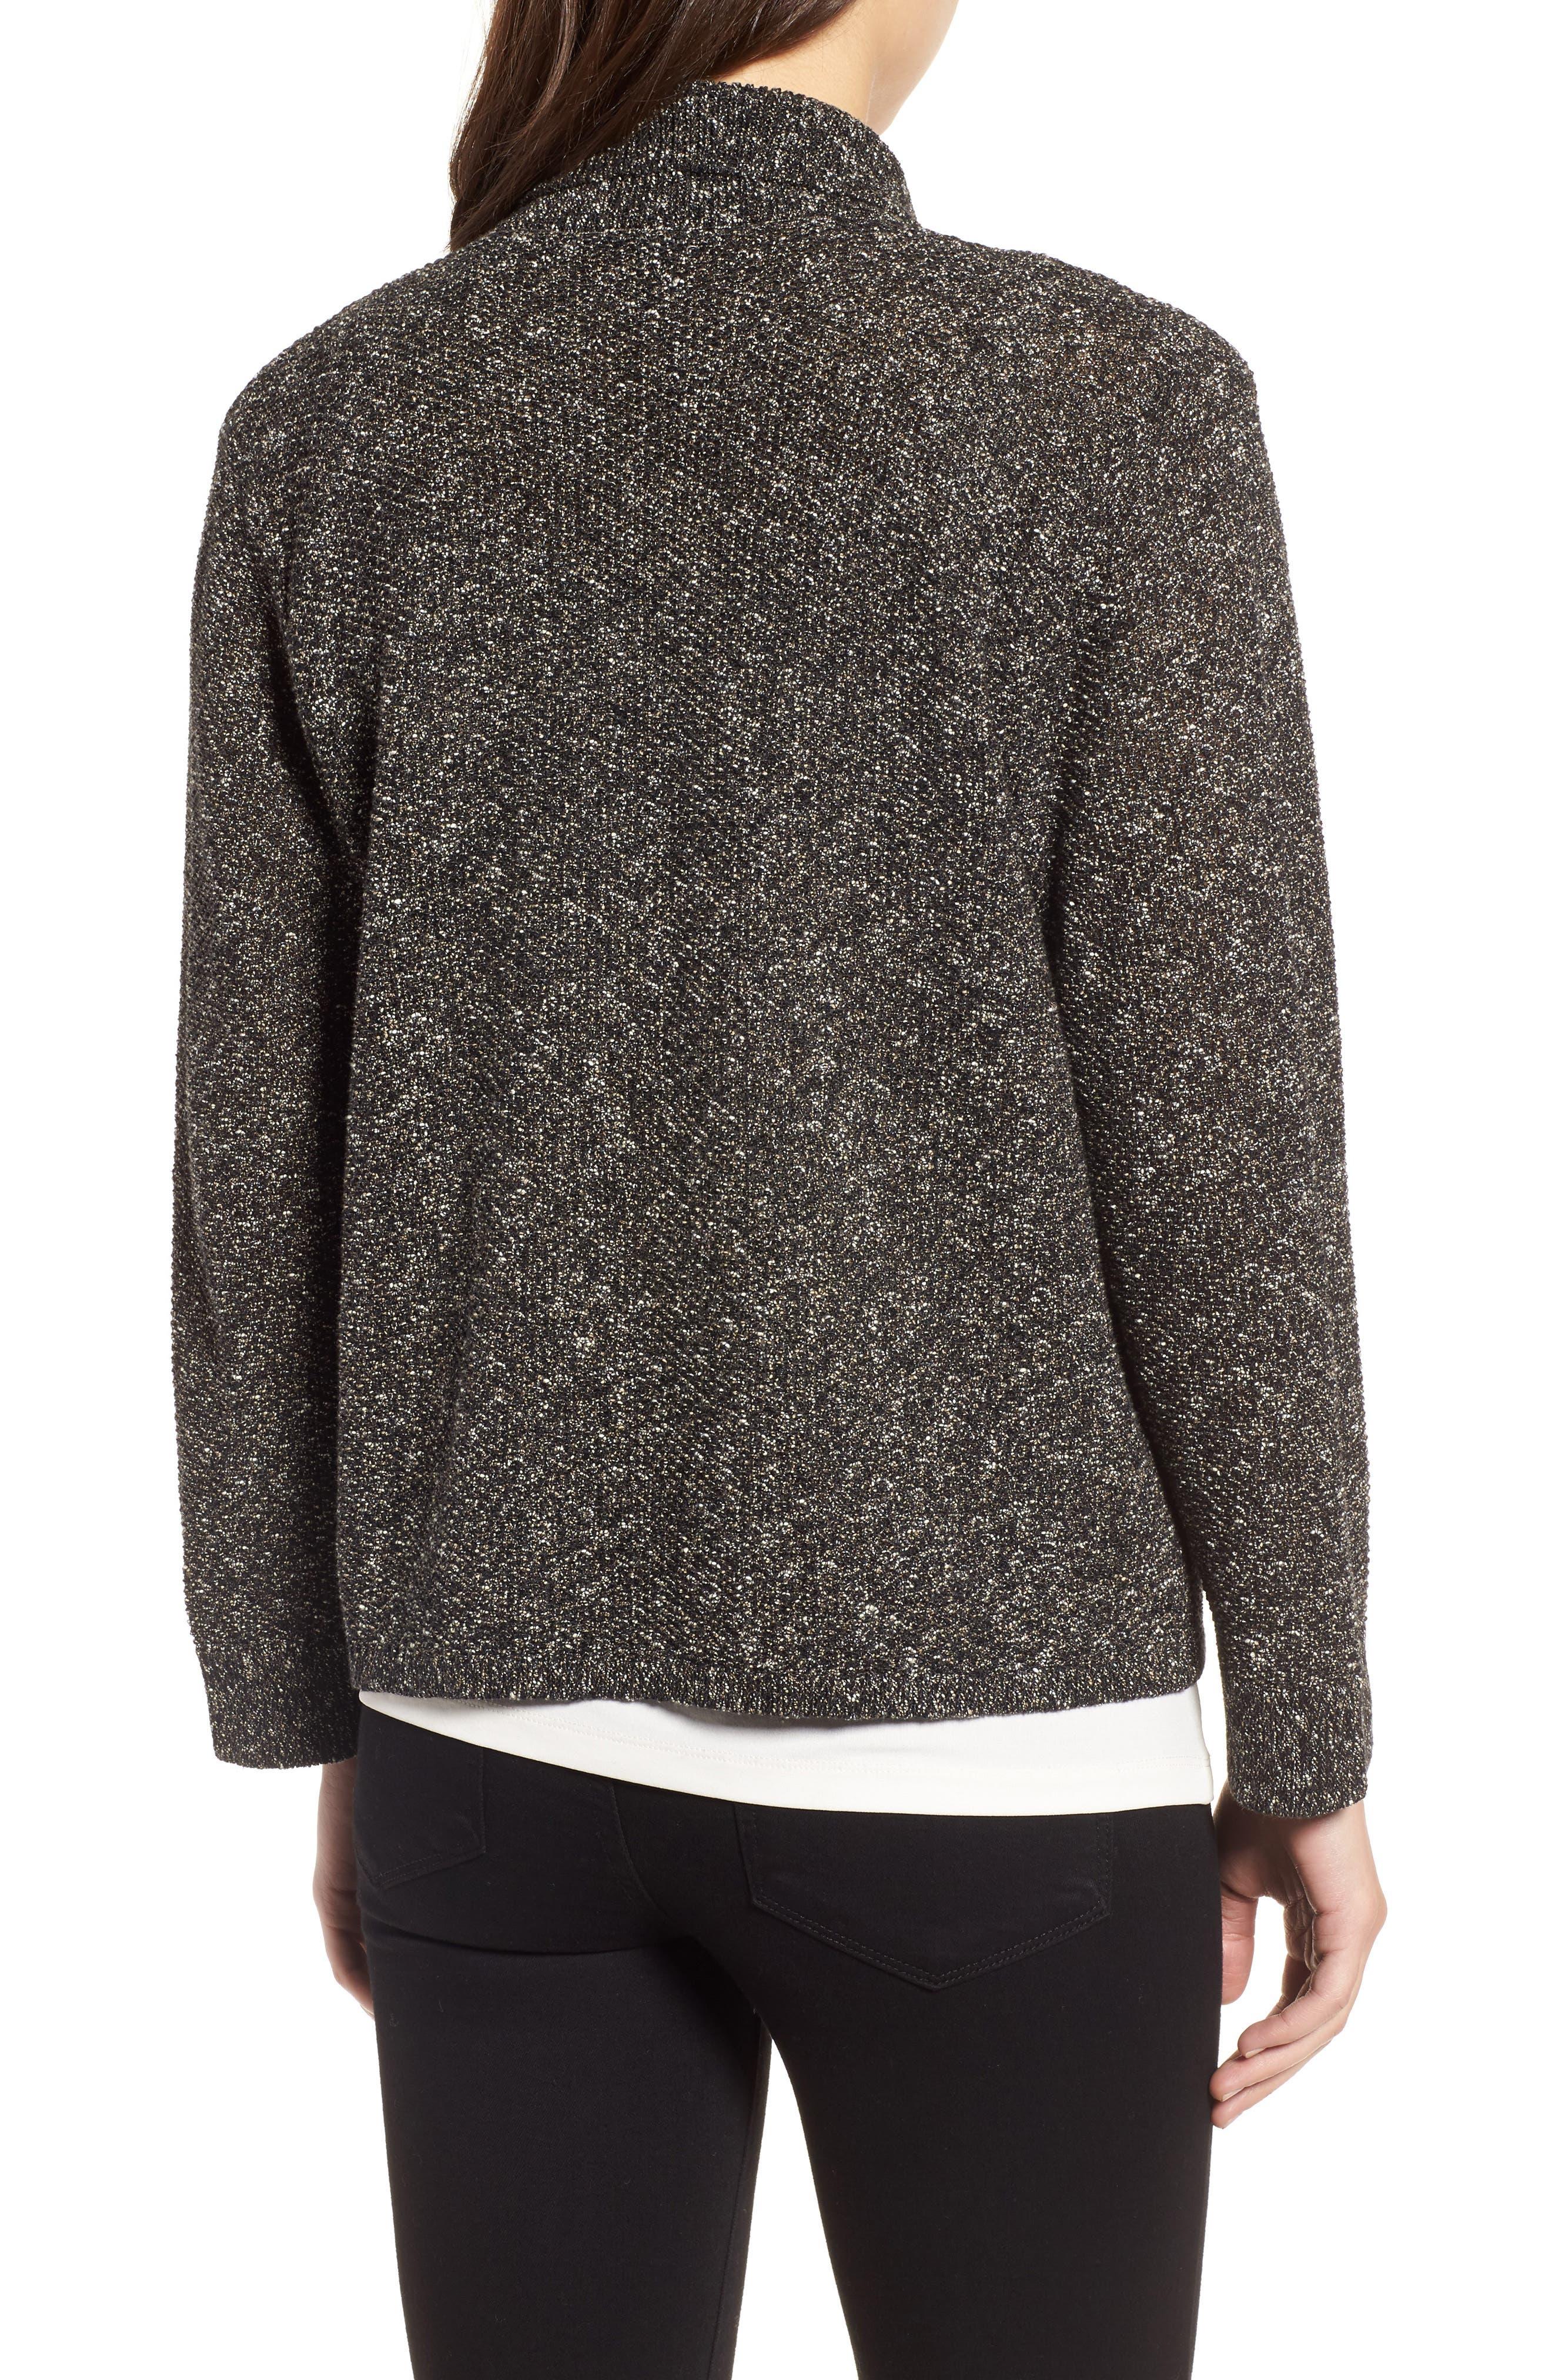 Alternate Image 2  - Eileen Fisher Tweed Sweater Jacket